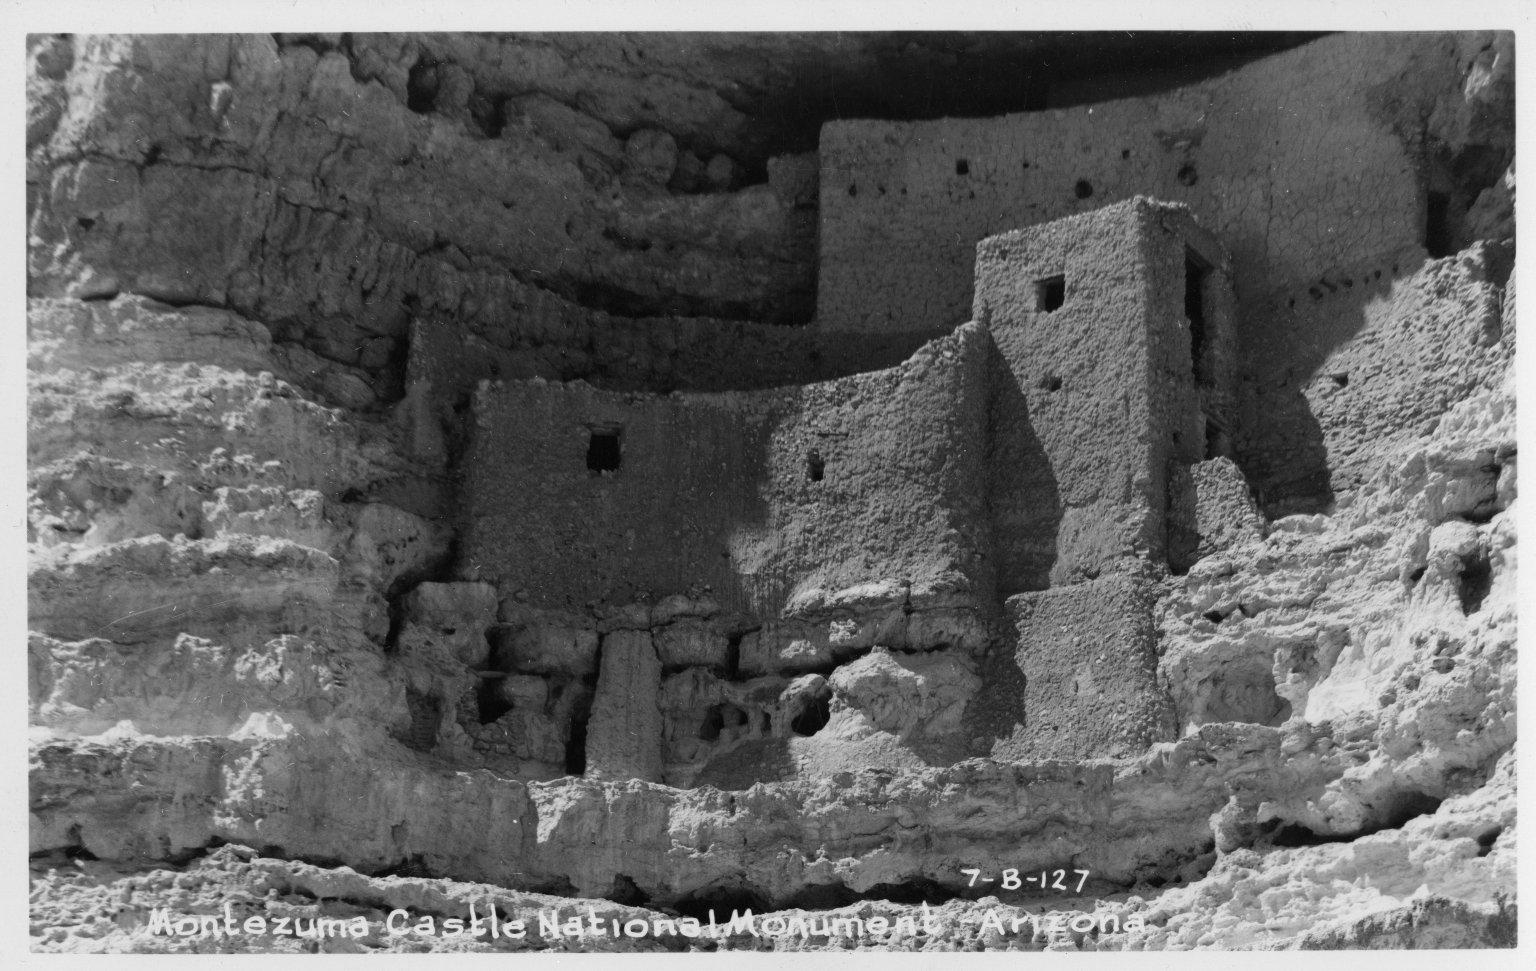 Anasazi ruin at Montezuma Castle National Monument, Arizona